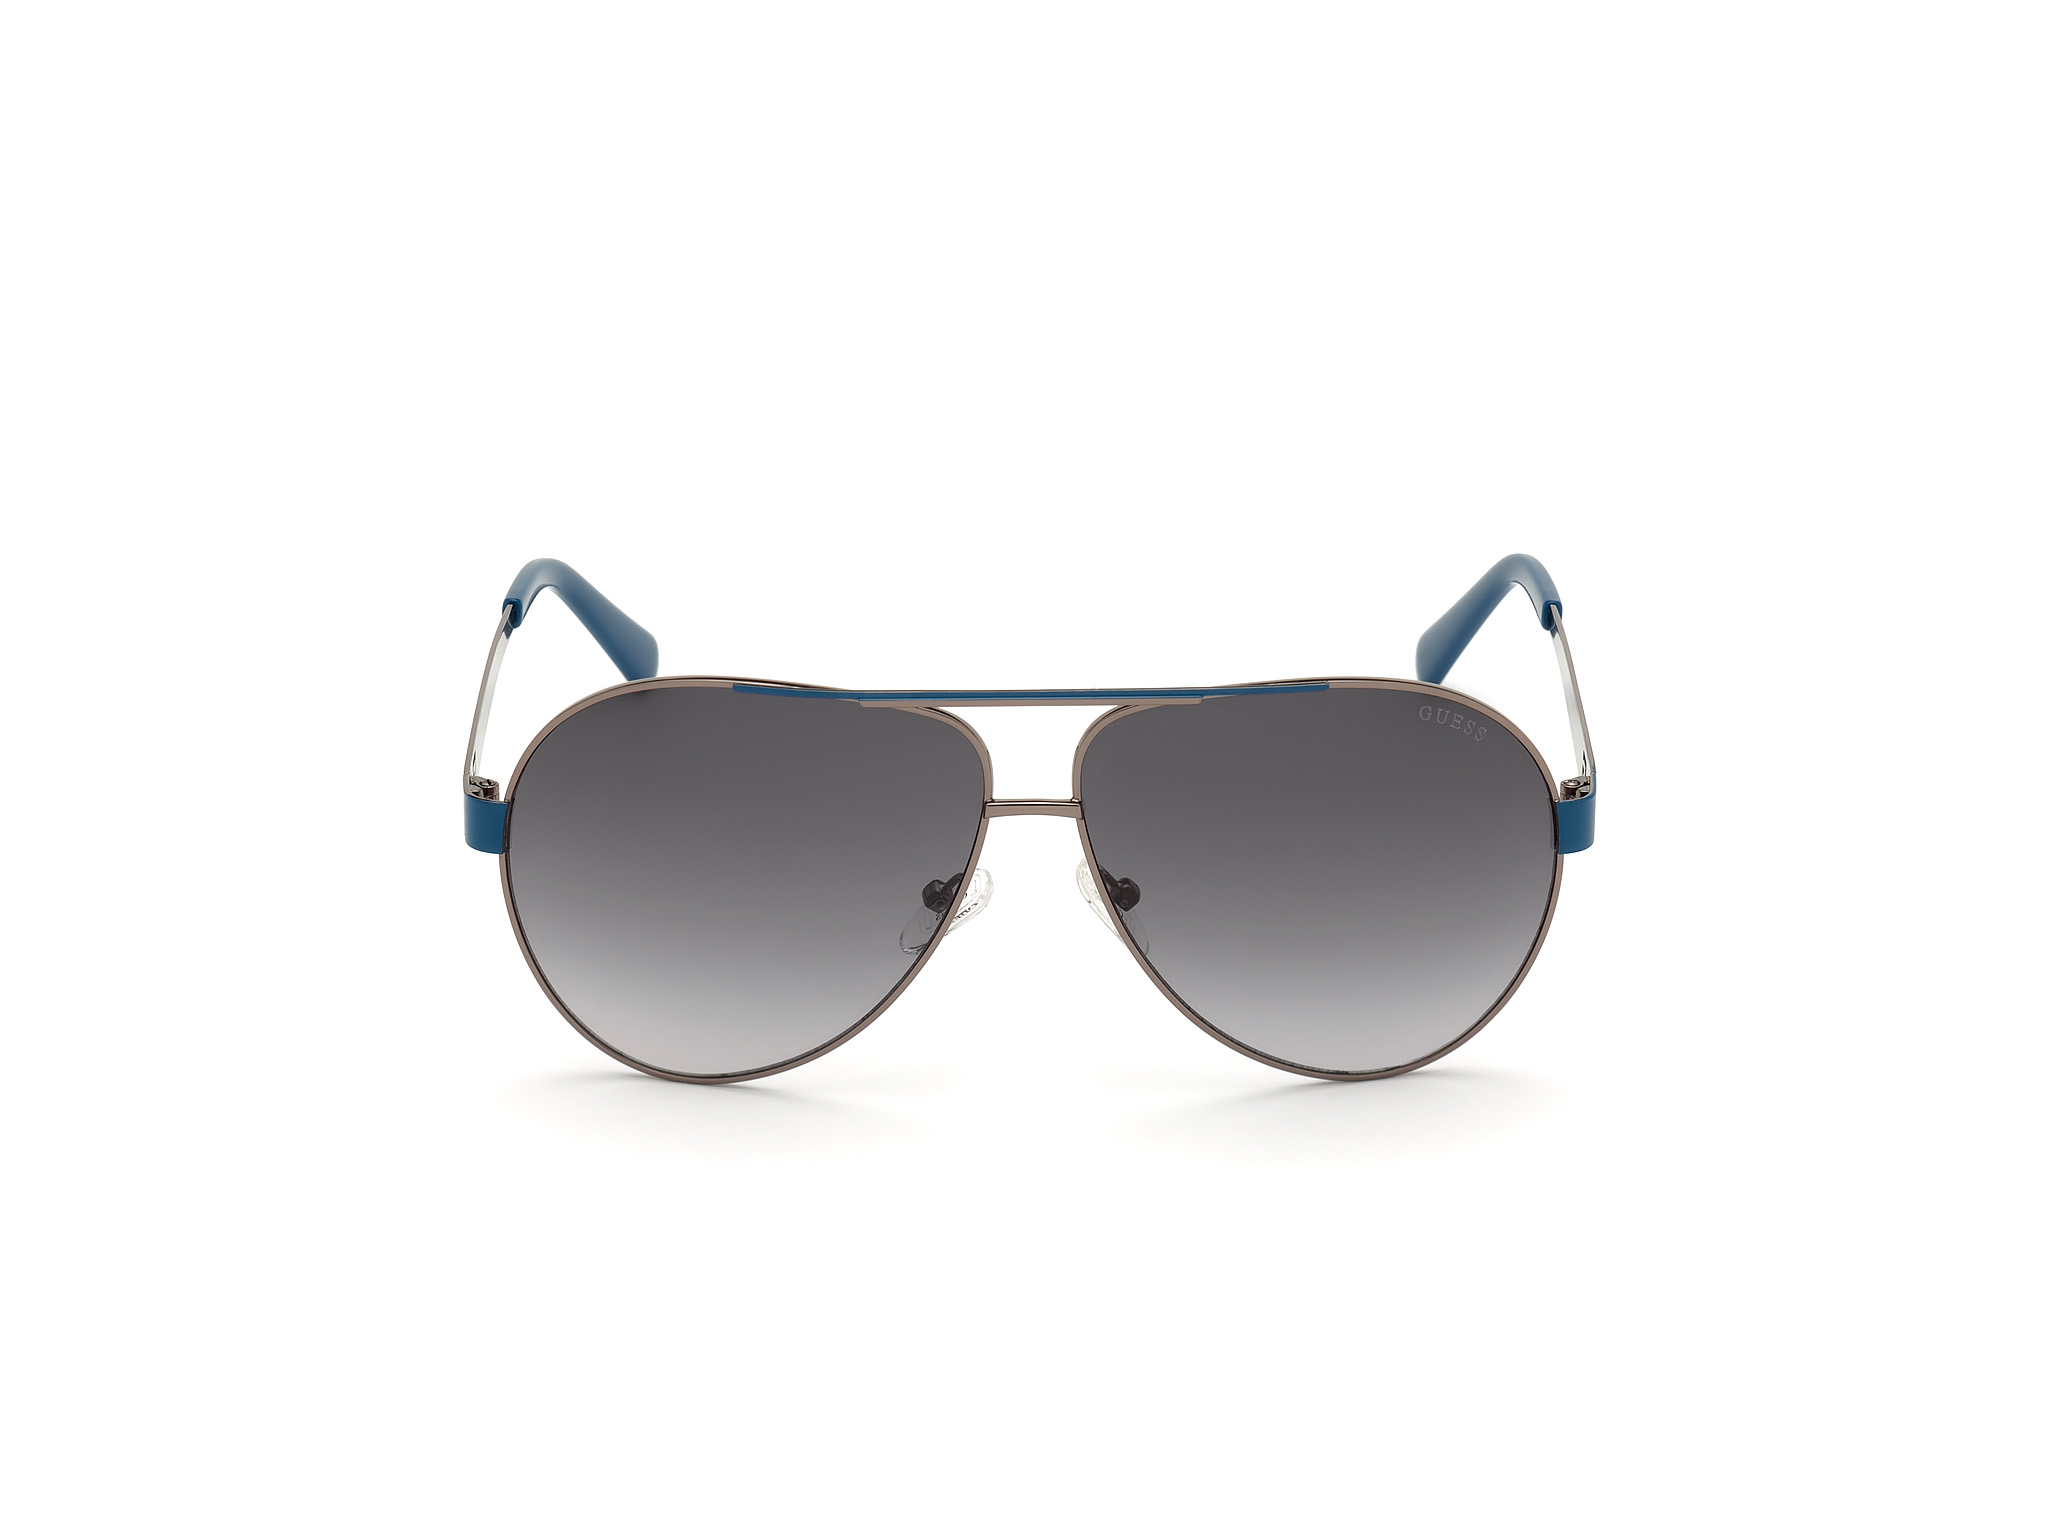 GUESS | Guess Grey Frame With Grey Lens Pilot Shape Men Sunglass